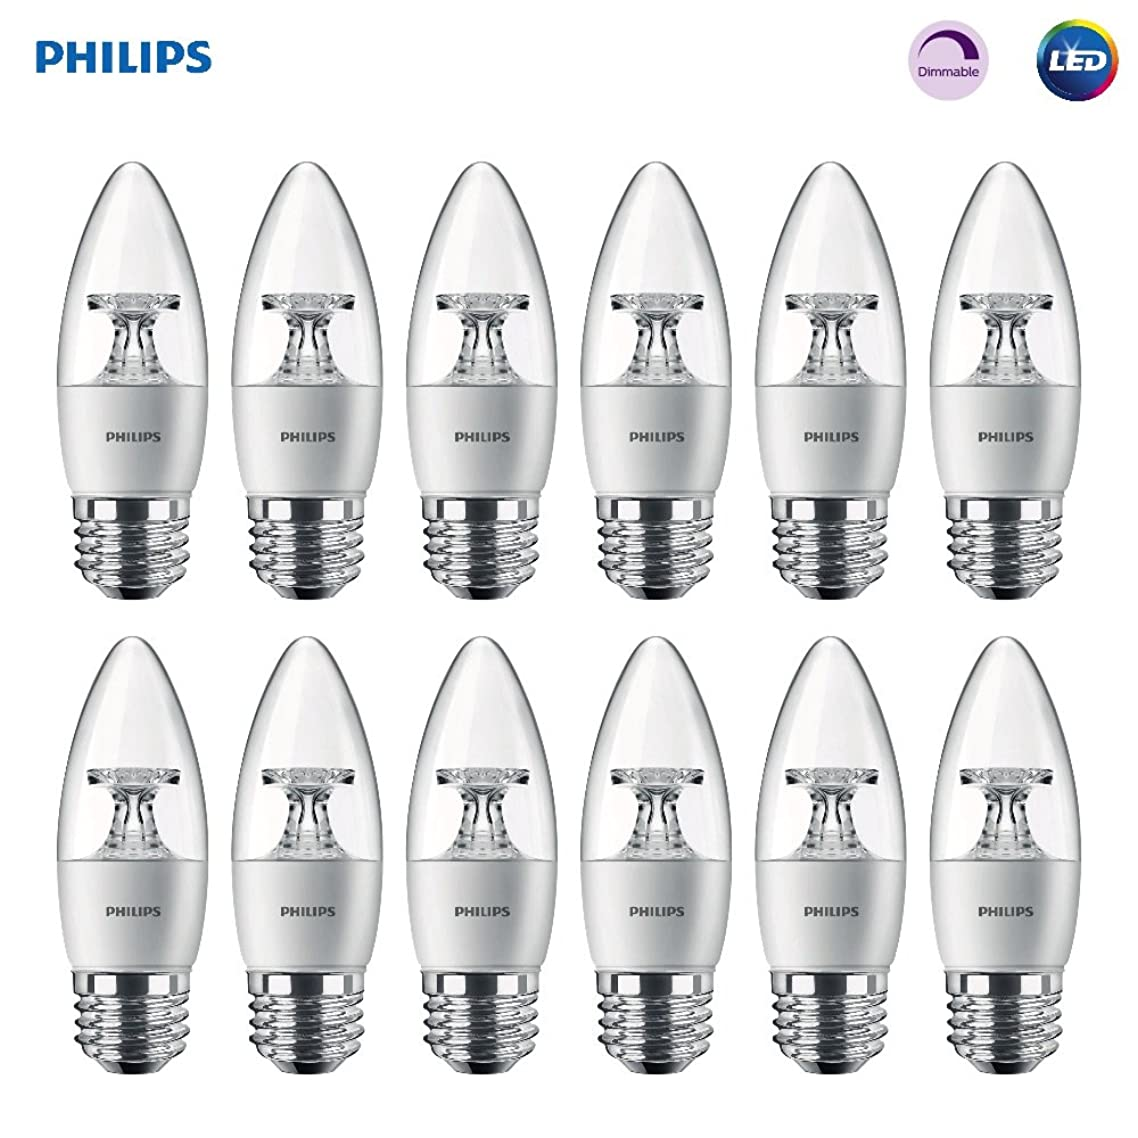 Philips LED Dimmable B11 Clear Candle Light Bulb: 300-Lumen, 5000-Kelvin, 4.5-Watt (40-Watt Equivalent), E26 Base, Daylight, 12-Pack